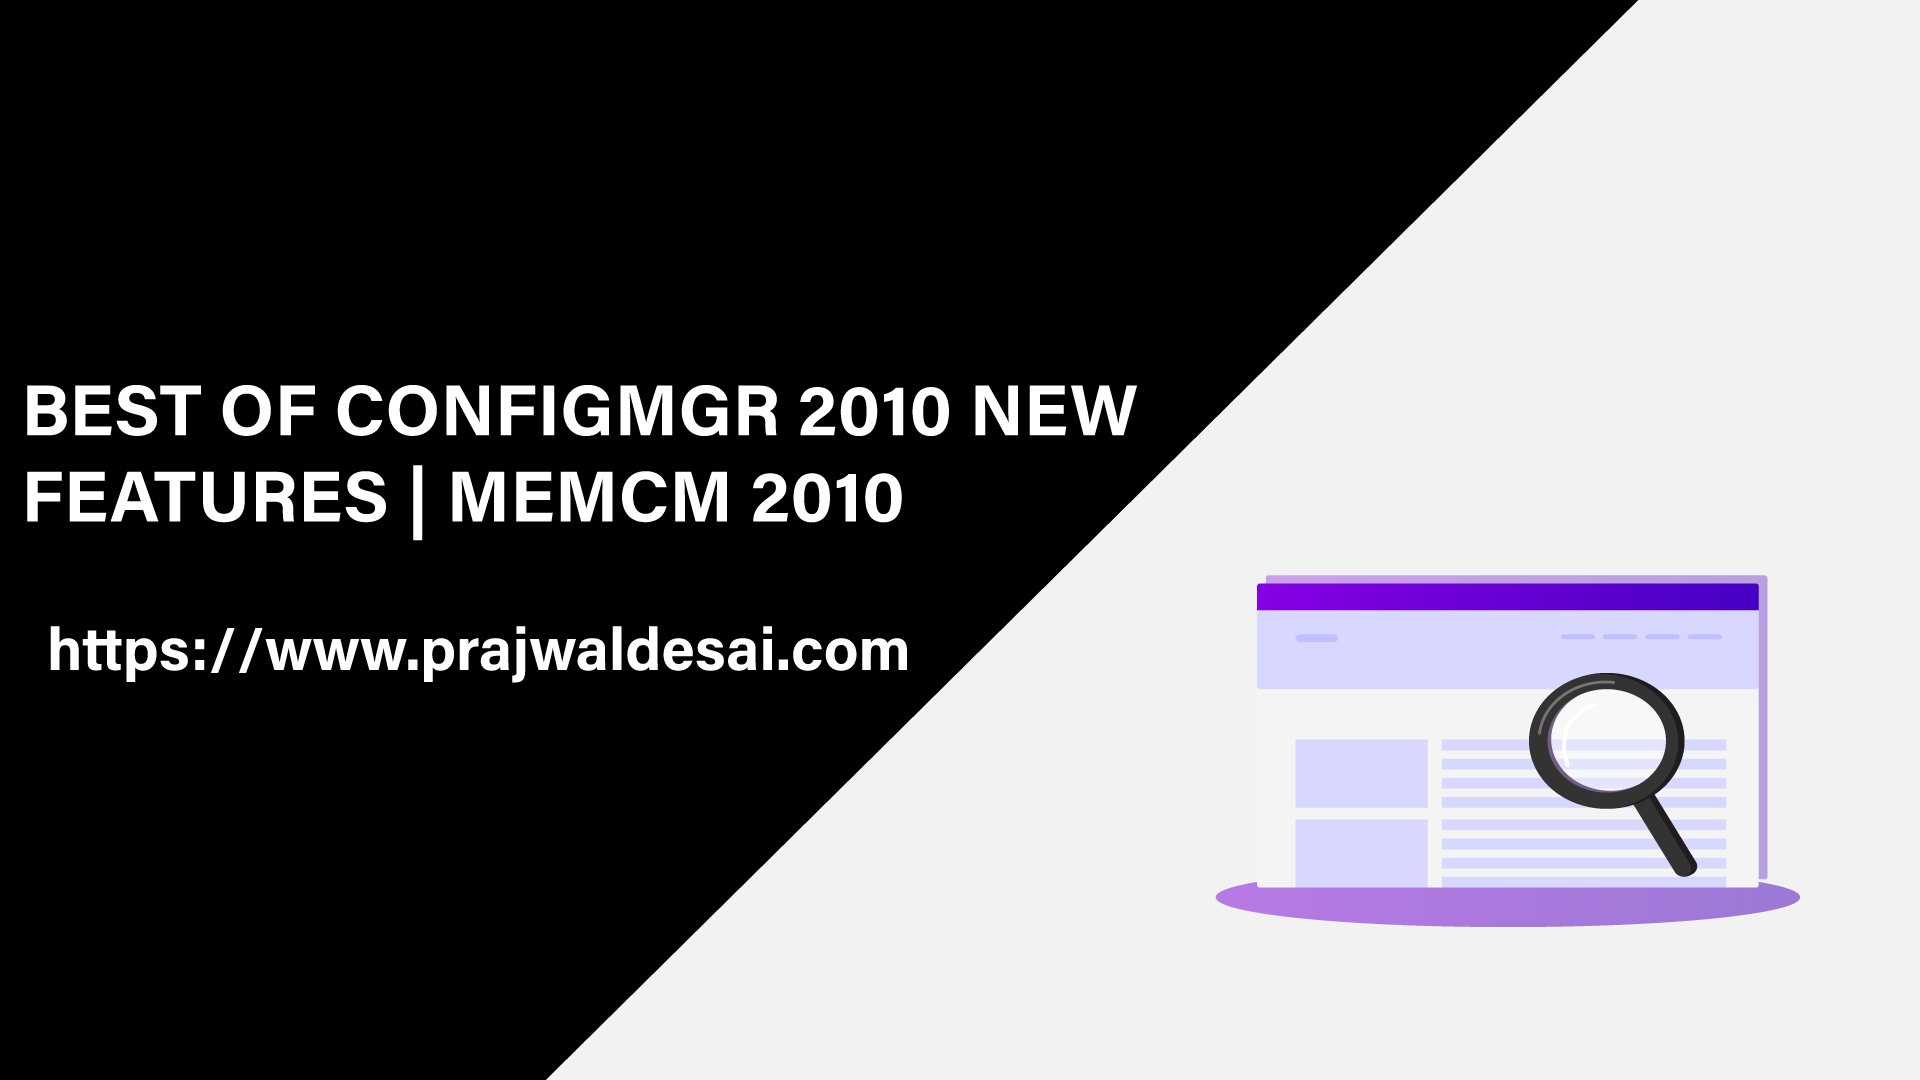 Best SCCM 2010 New Features